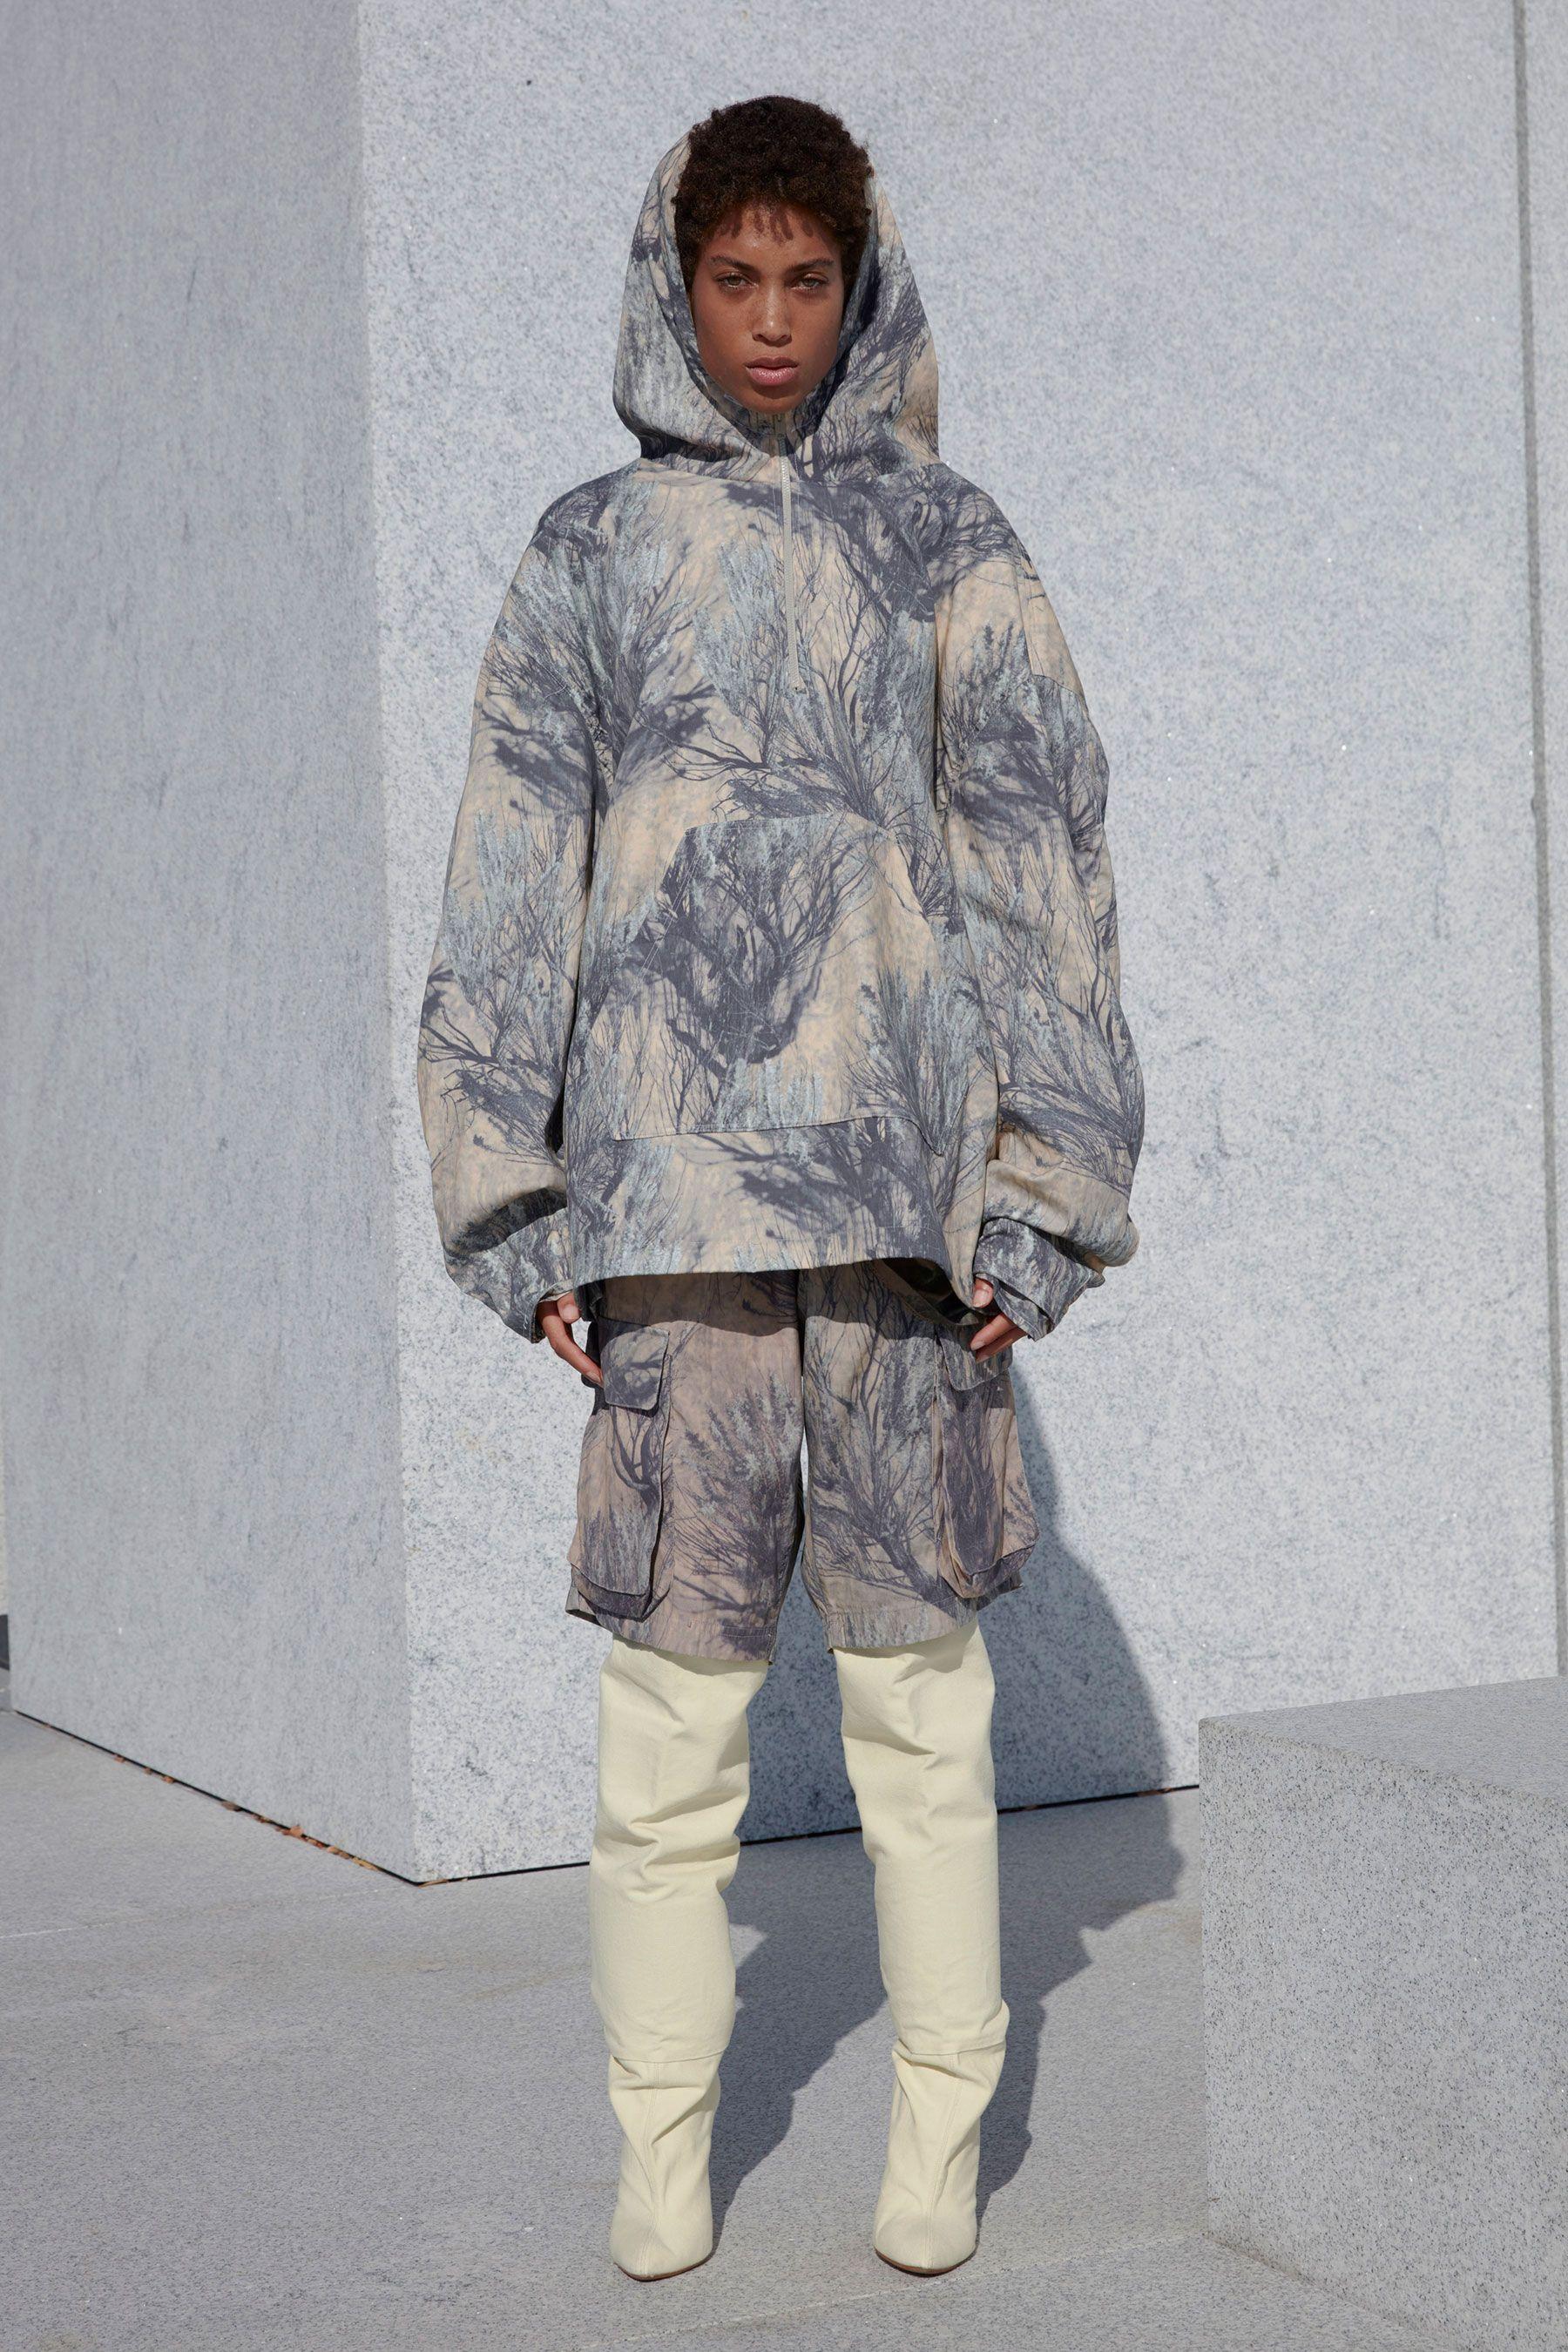 Enjoy Every Look From Kanye S Yeezy Season 4 Fashion Show Yeezy Fashion Yeezy Season 4 Yeezy Season